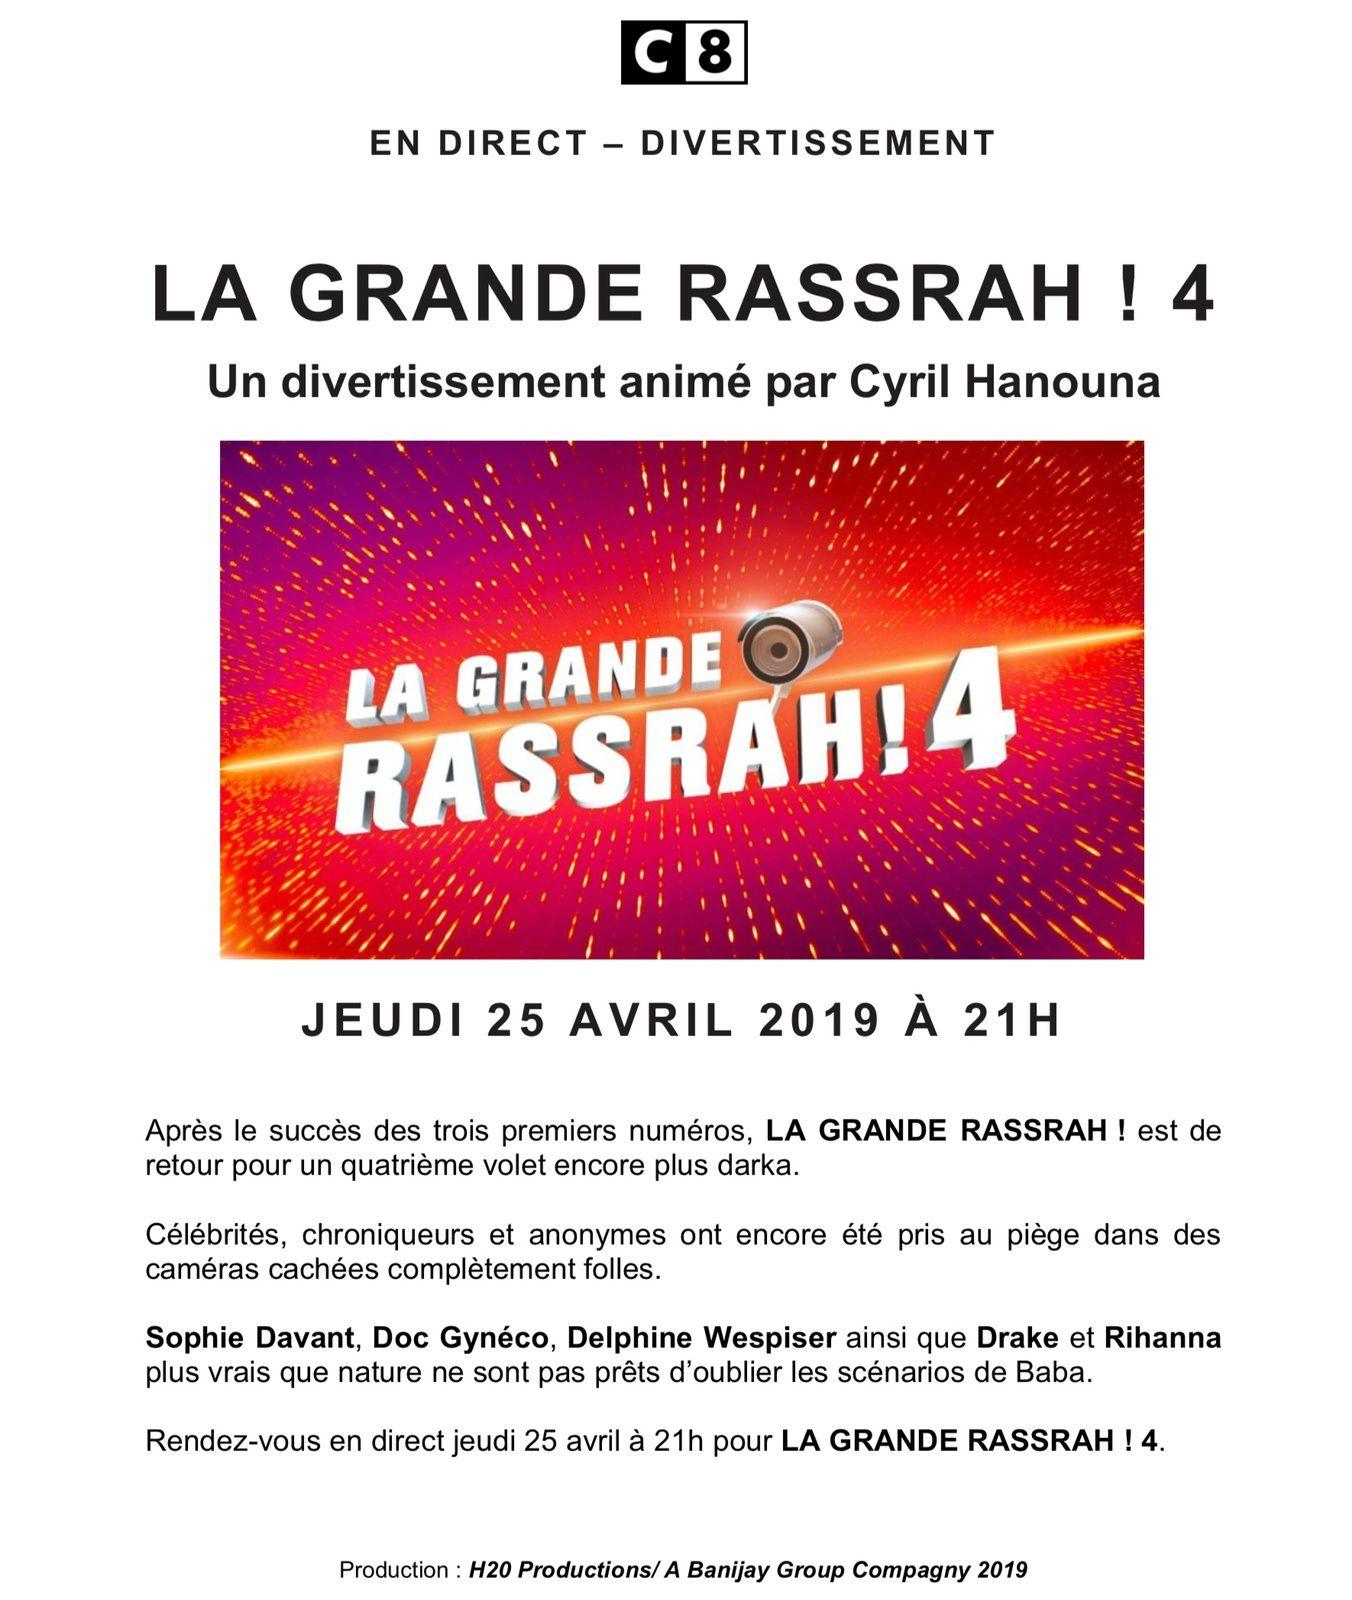 La Grande Rassrah 4 sur C8, le 25 avril avec Cyril Hanouna.